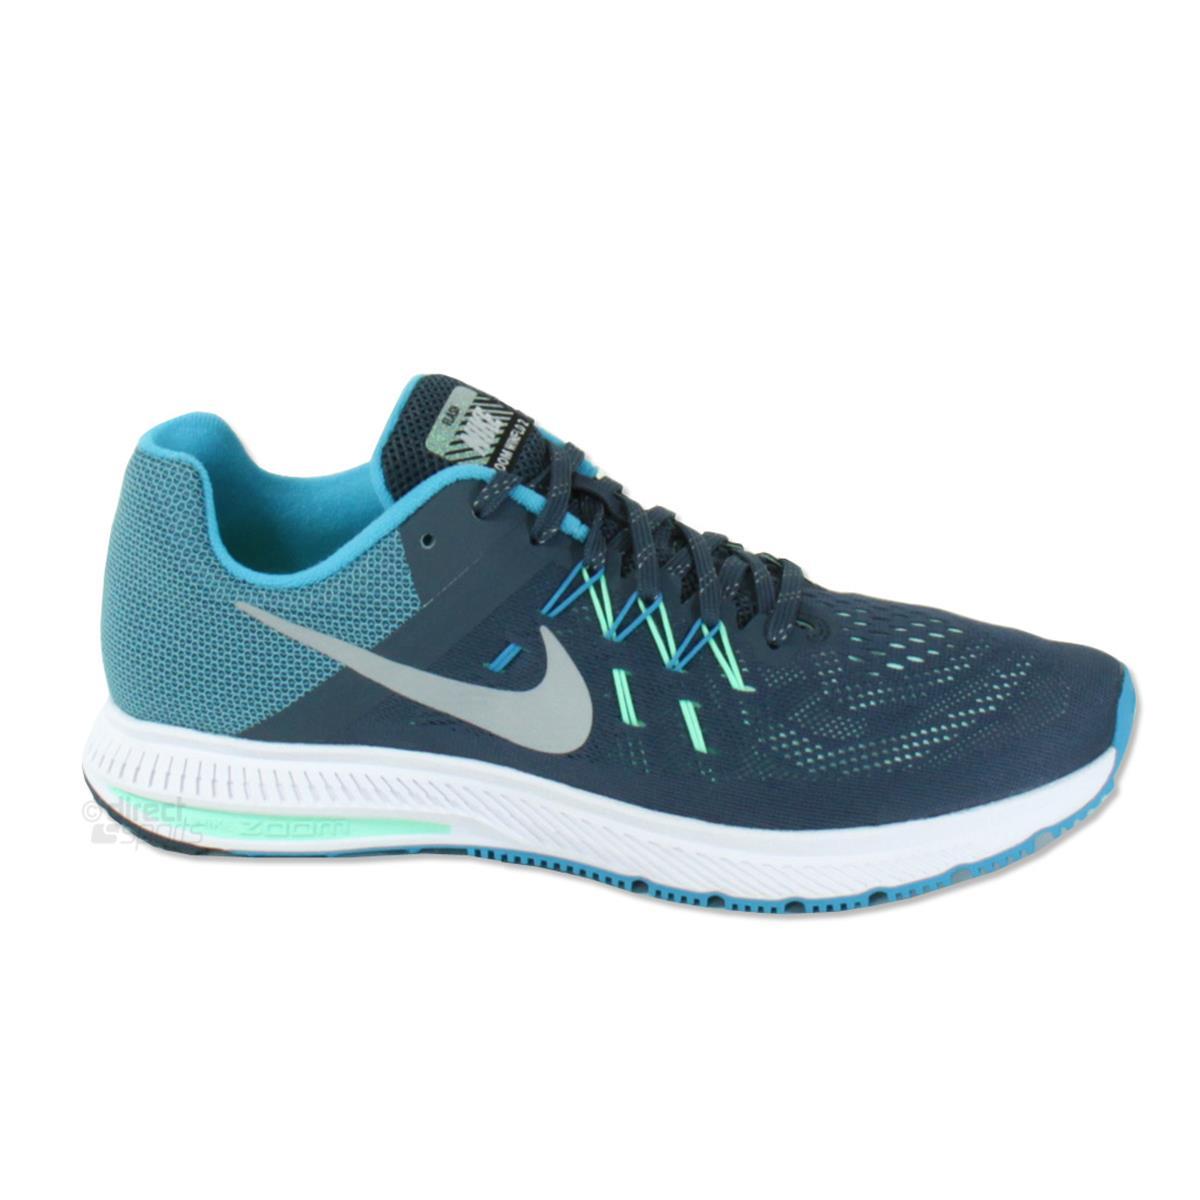 f13647828f98b ... Nike Zoom Winflo 2 Flash Mens Running Shoes ...